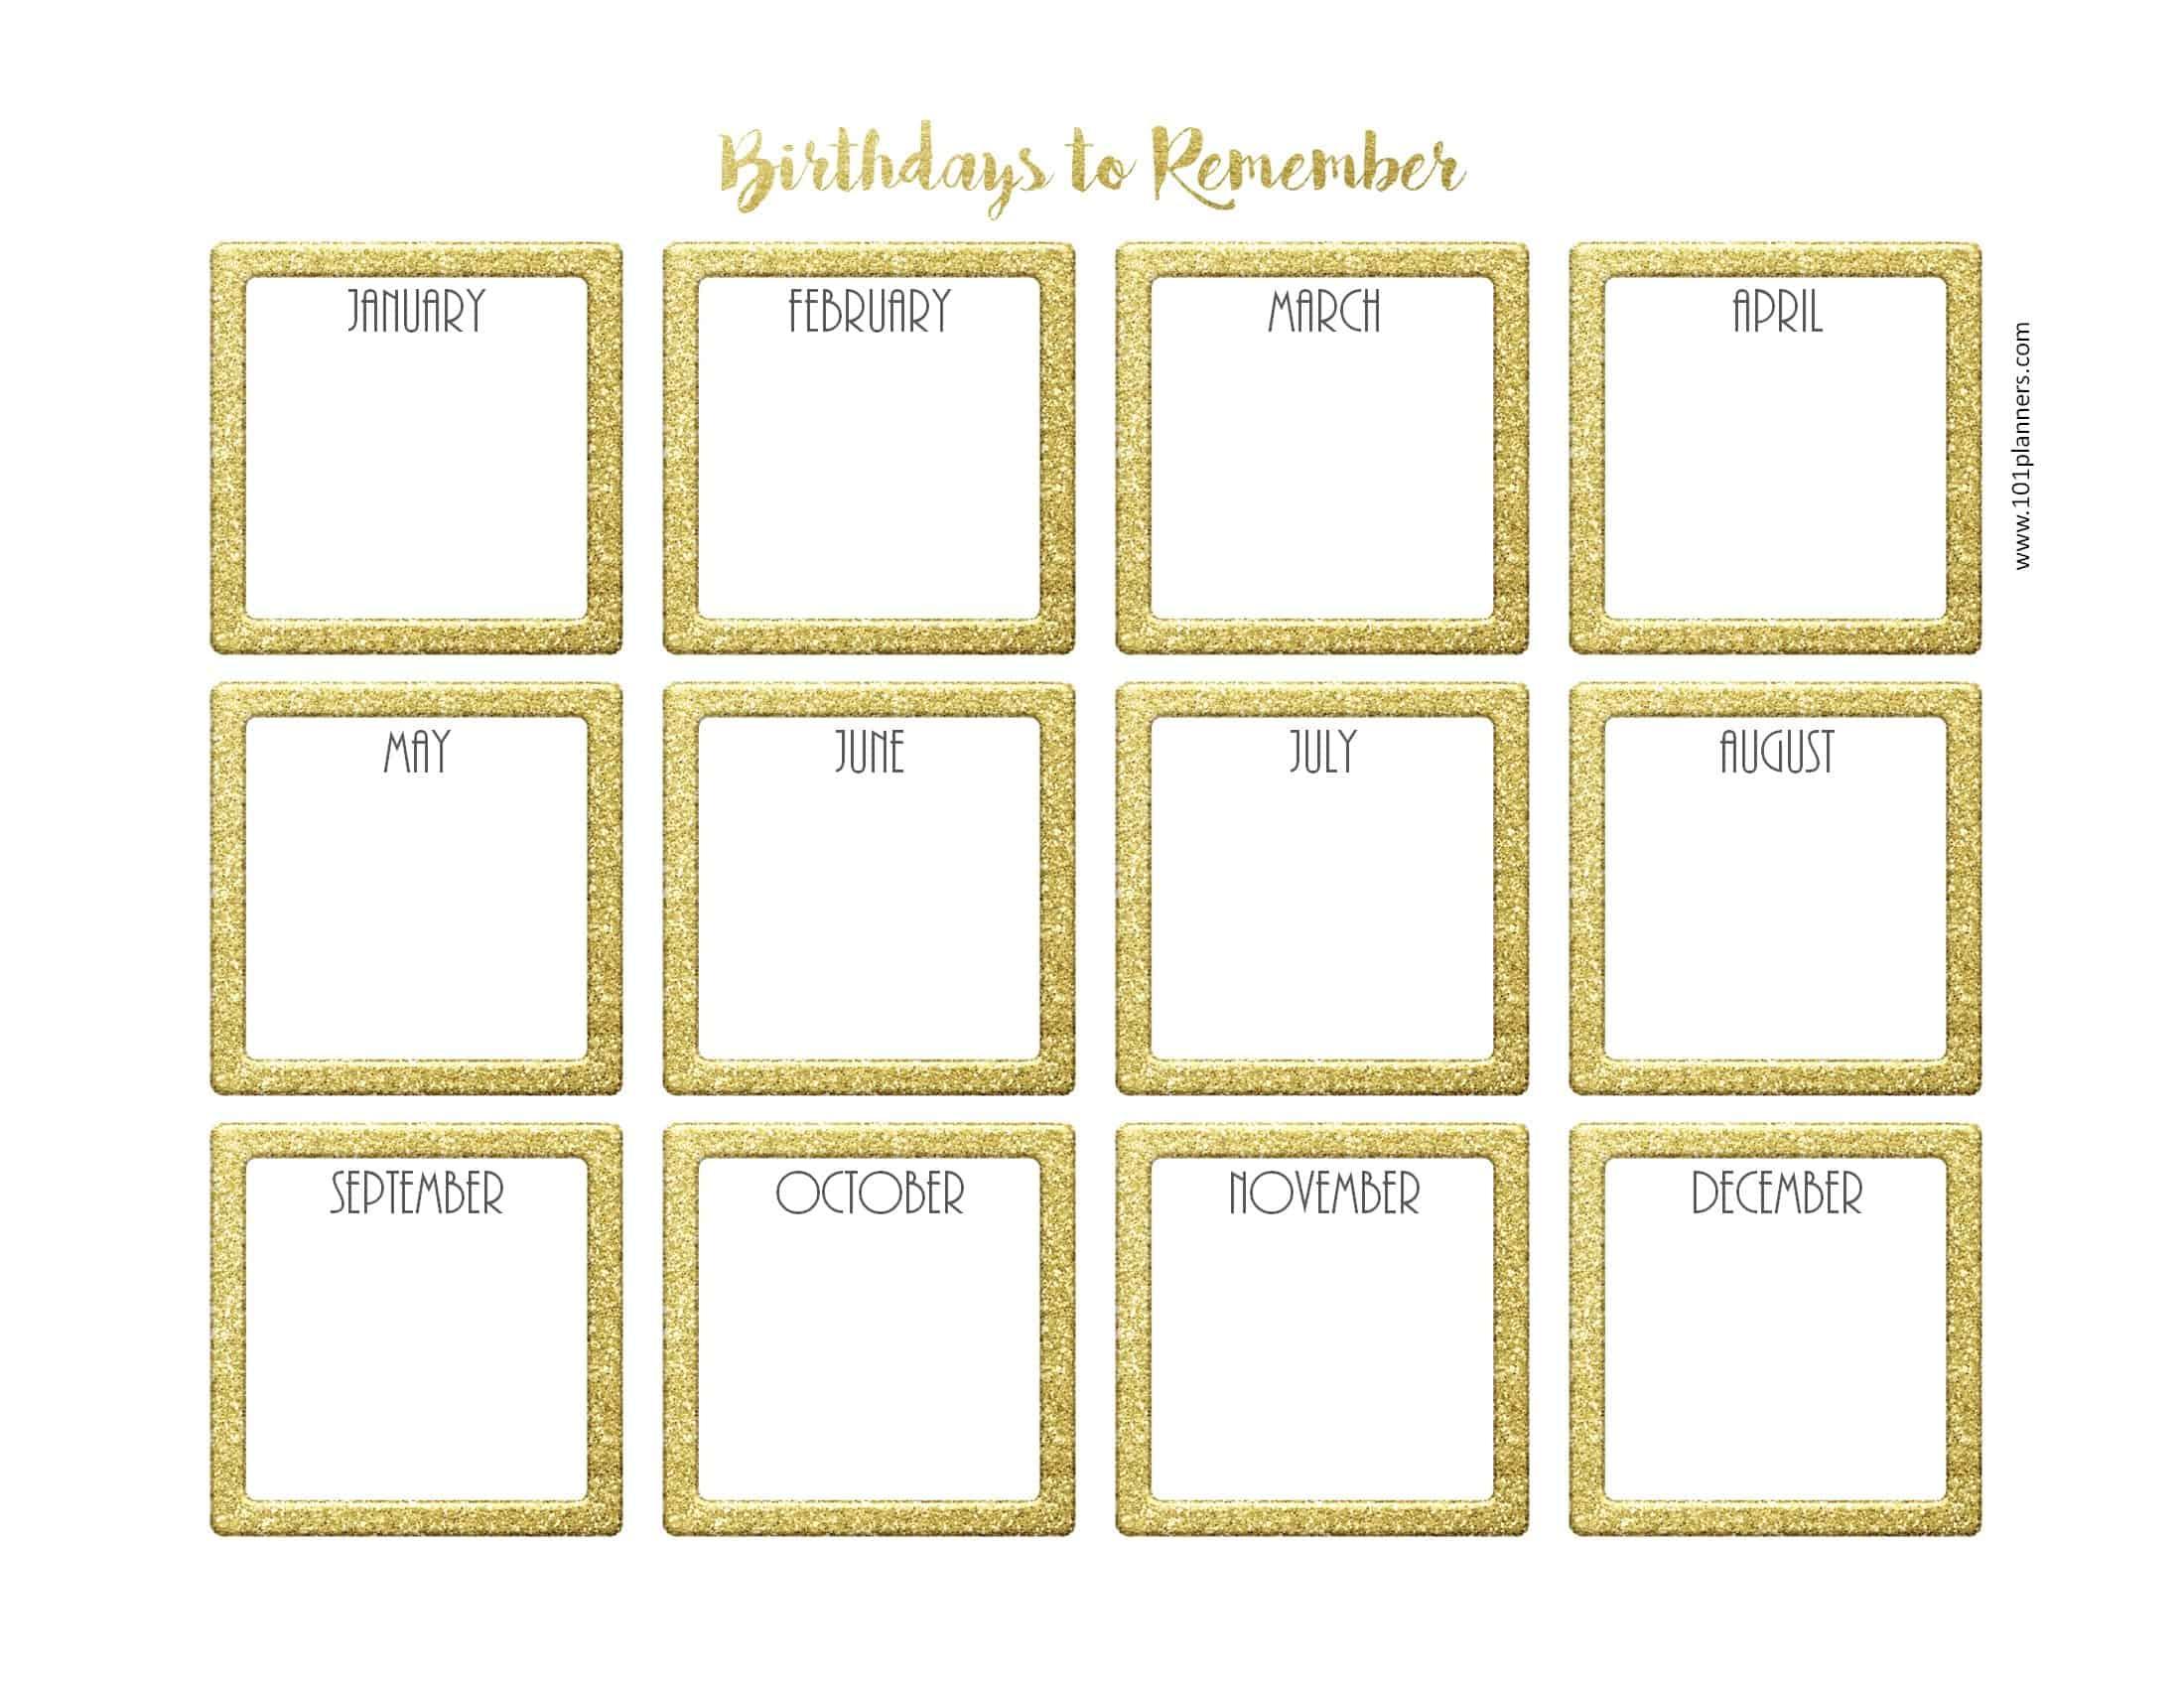 Free Birthday Calendar | Printable & Customizable | Many Designs! regarding Blank Monthly Birthday Calendars